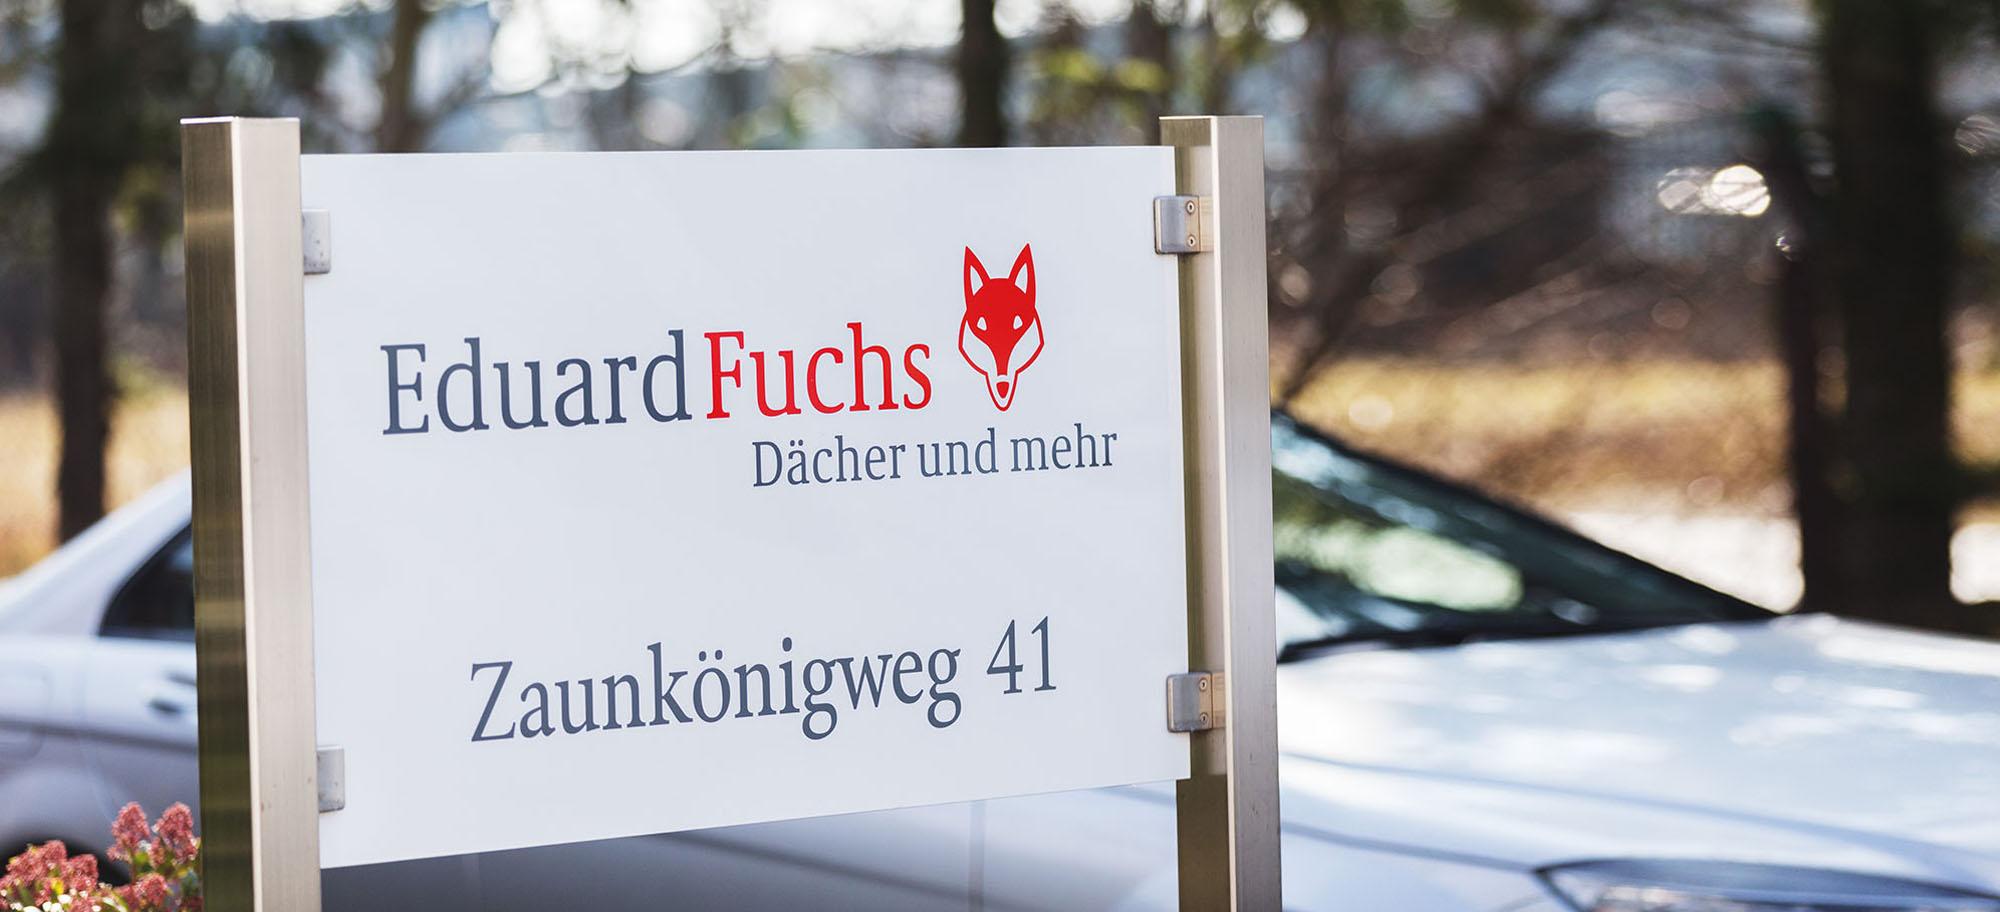 Eduard Fuchs e.K.